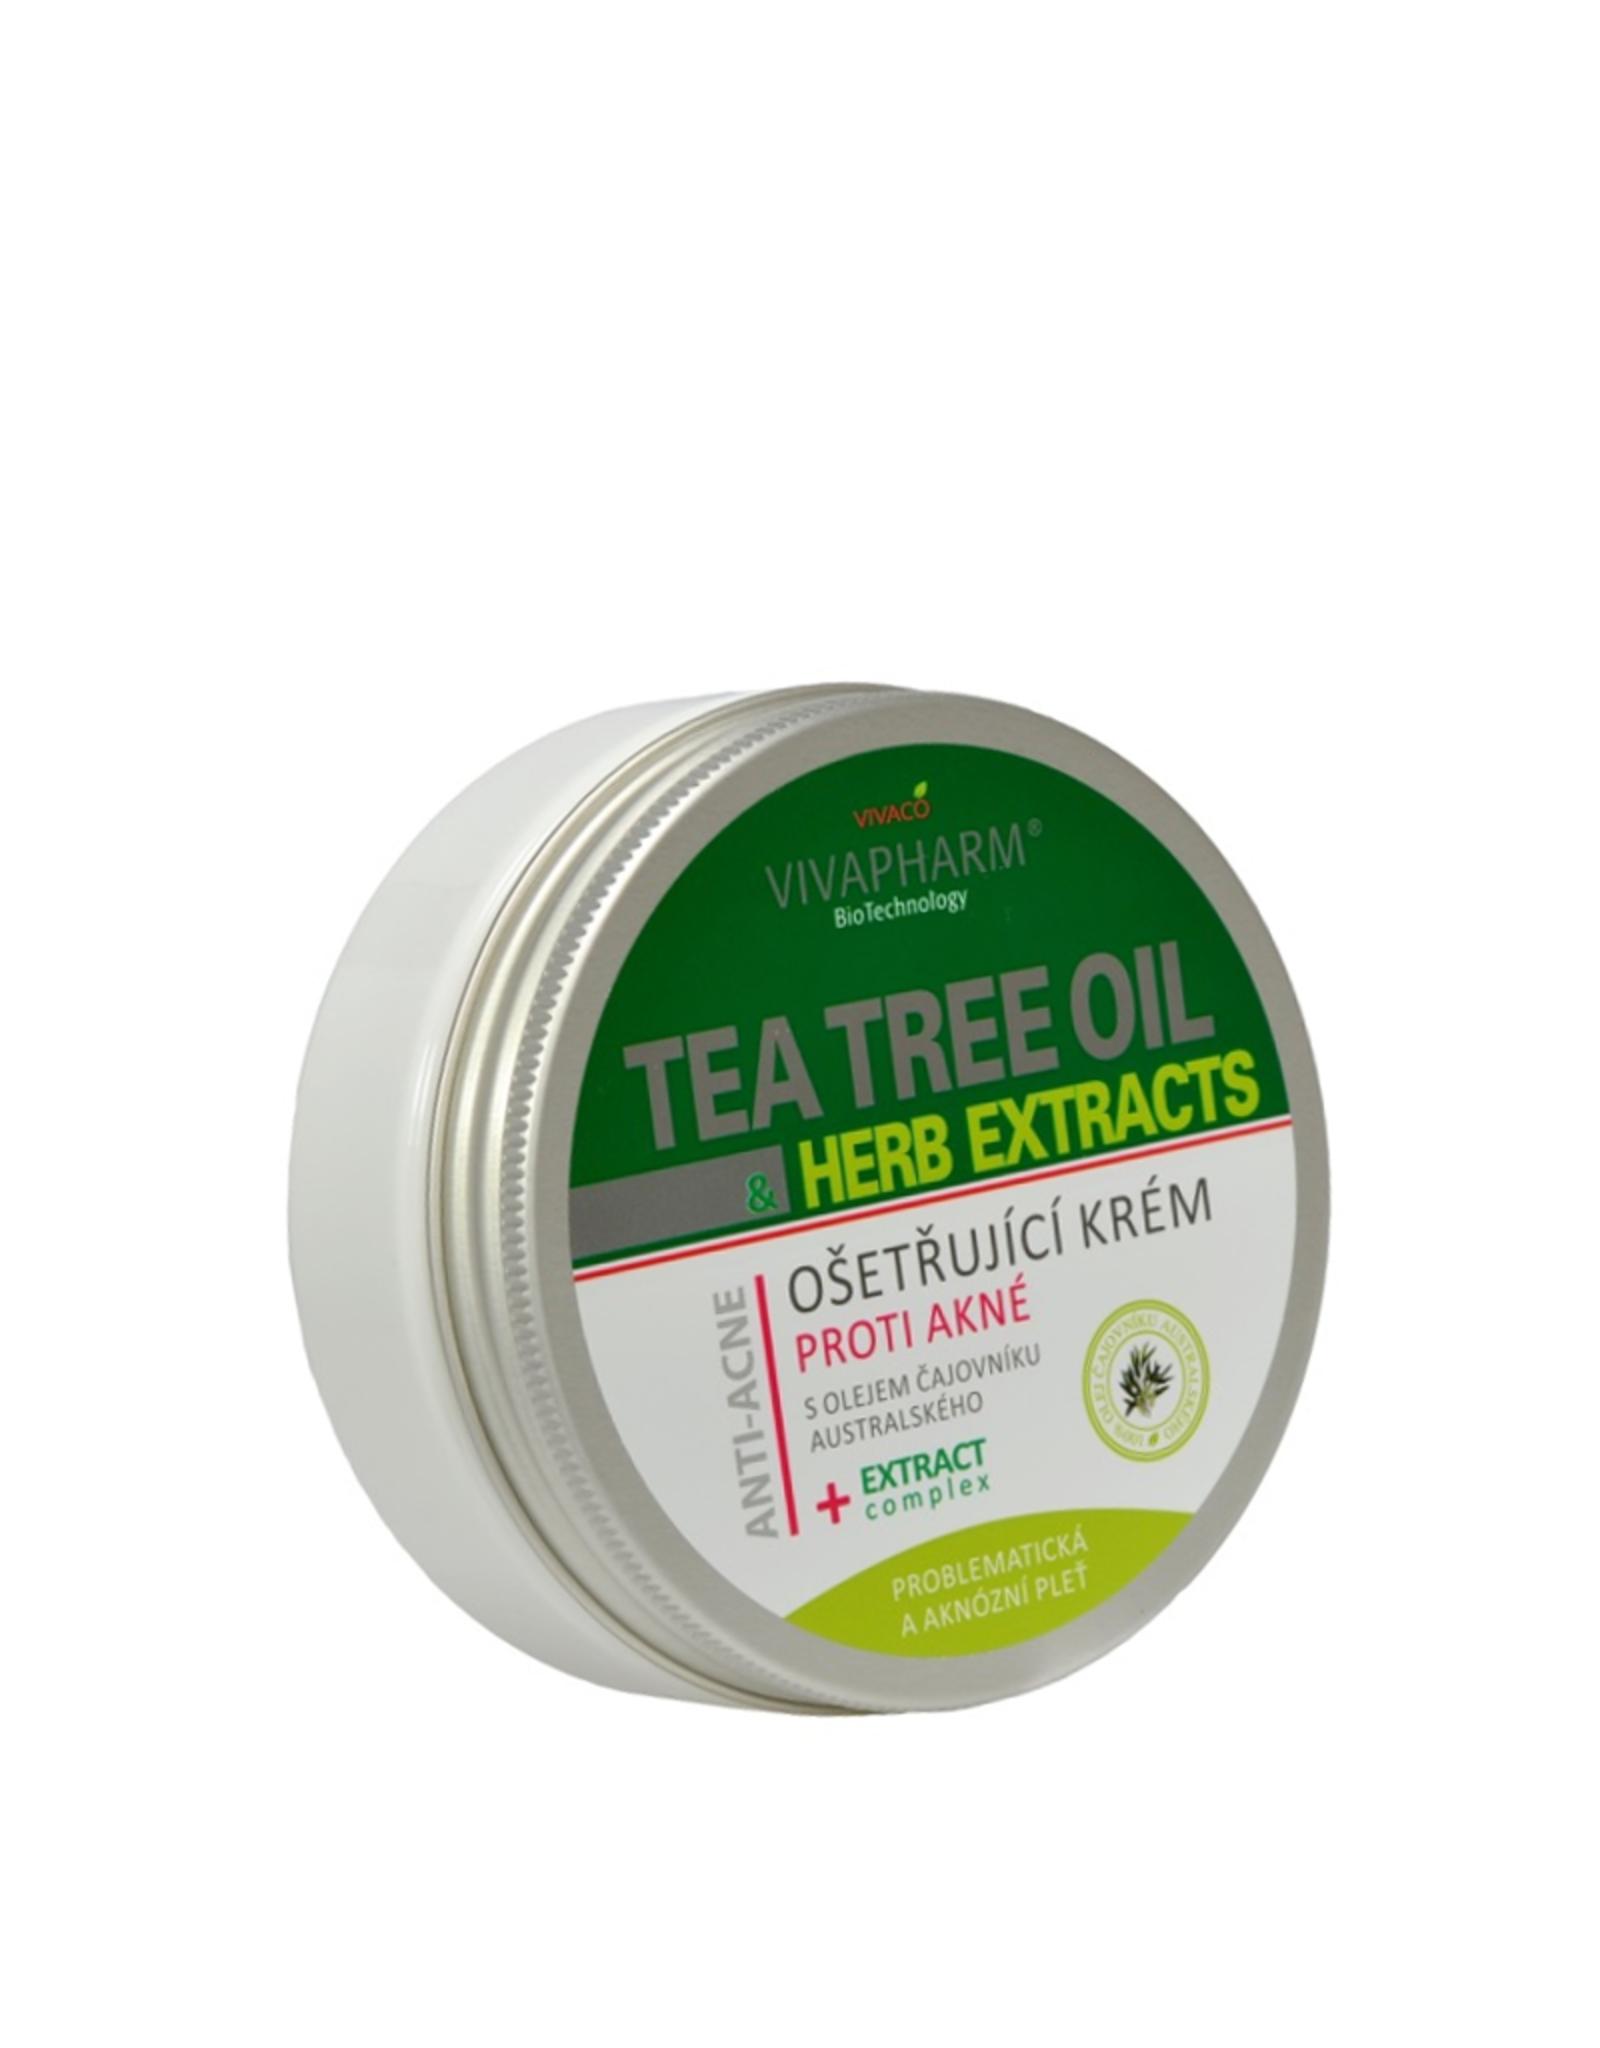 VIVAPHARM®   Behandelingscrème tegen acné met Tea Tree olie en kruidenextracten